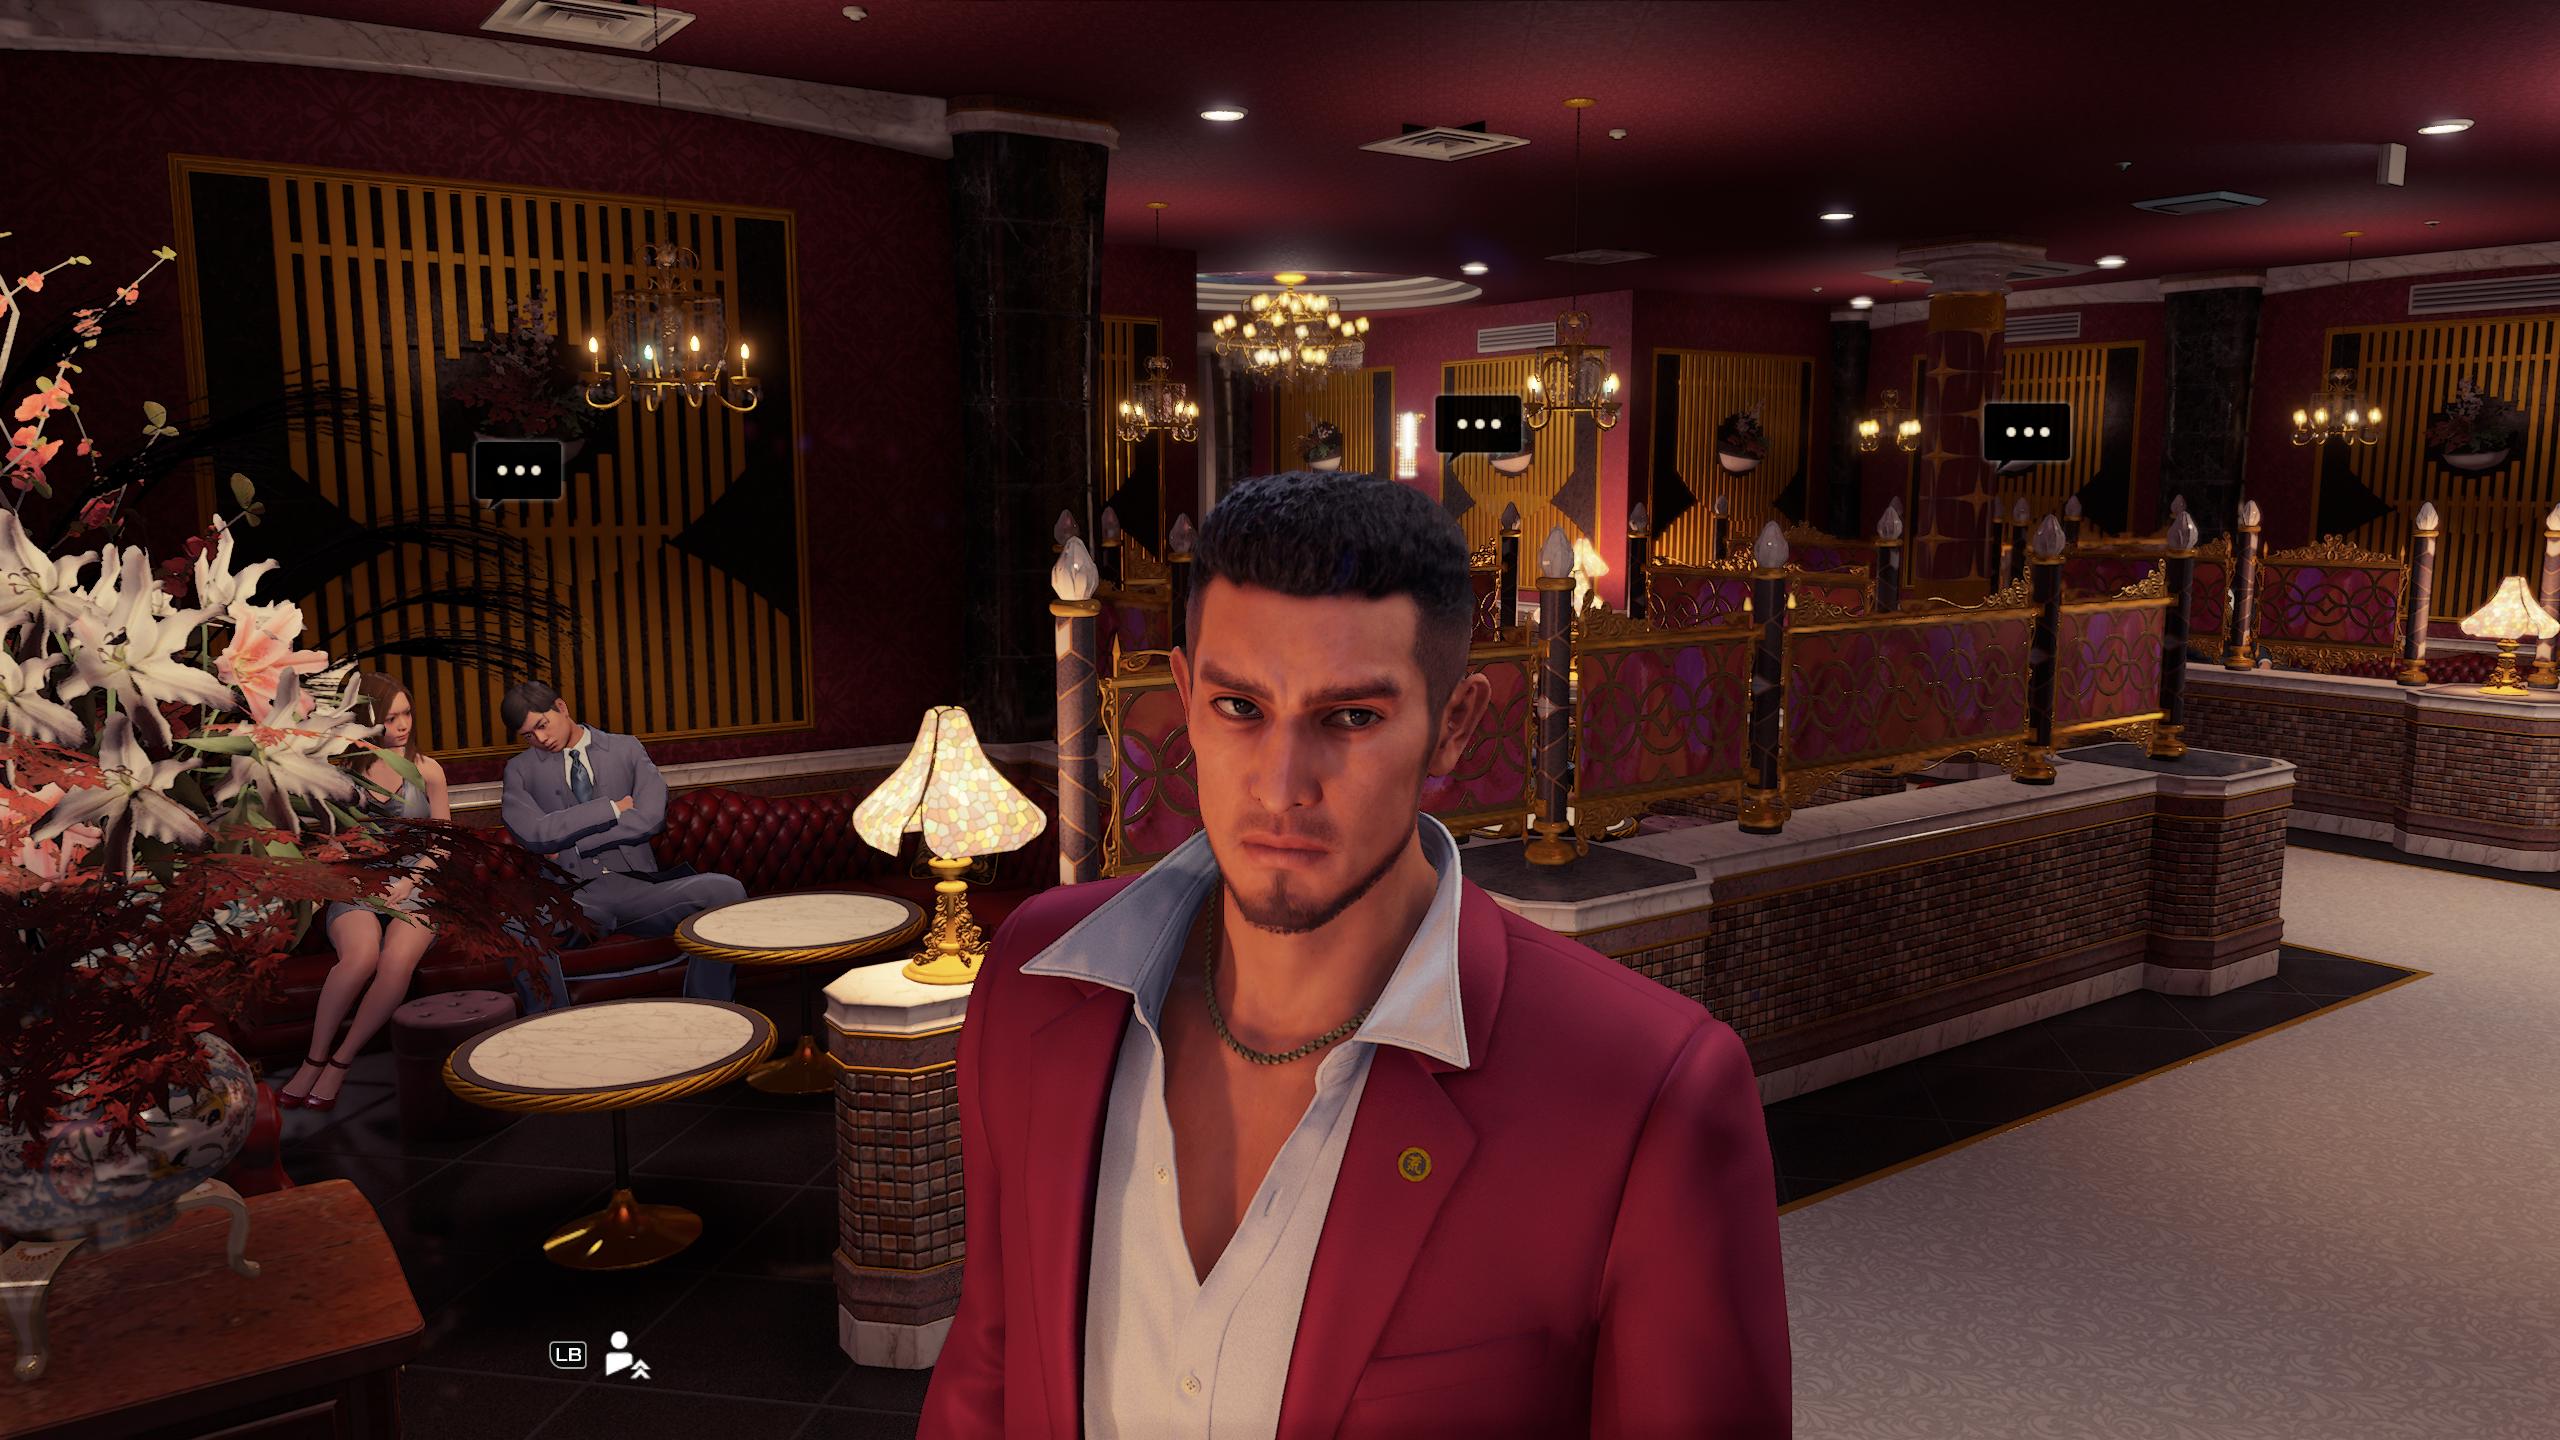 Yakuza: Like a Dragon protagonist Ichiban standing inside of a maid café